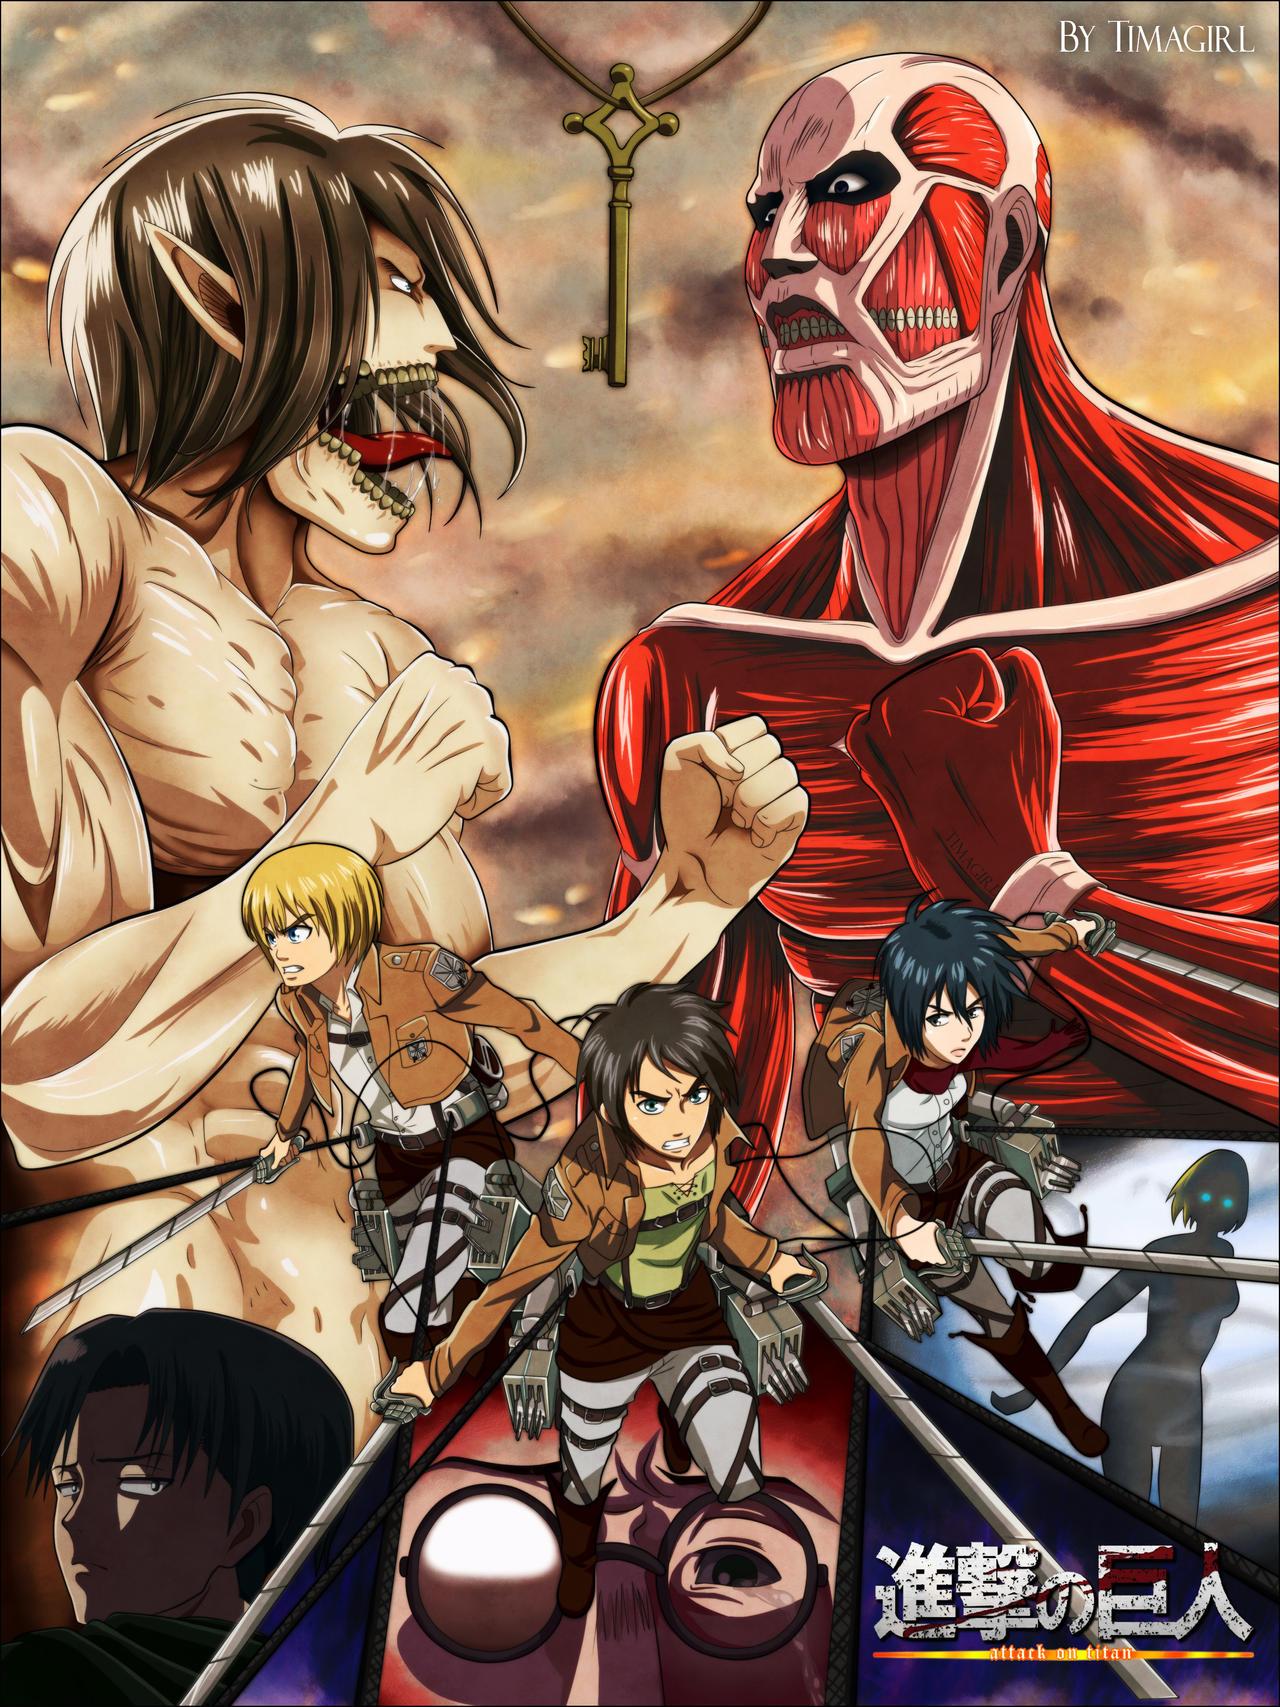 Shingeki no Kyojin - MAX Poster by Timagirl